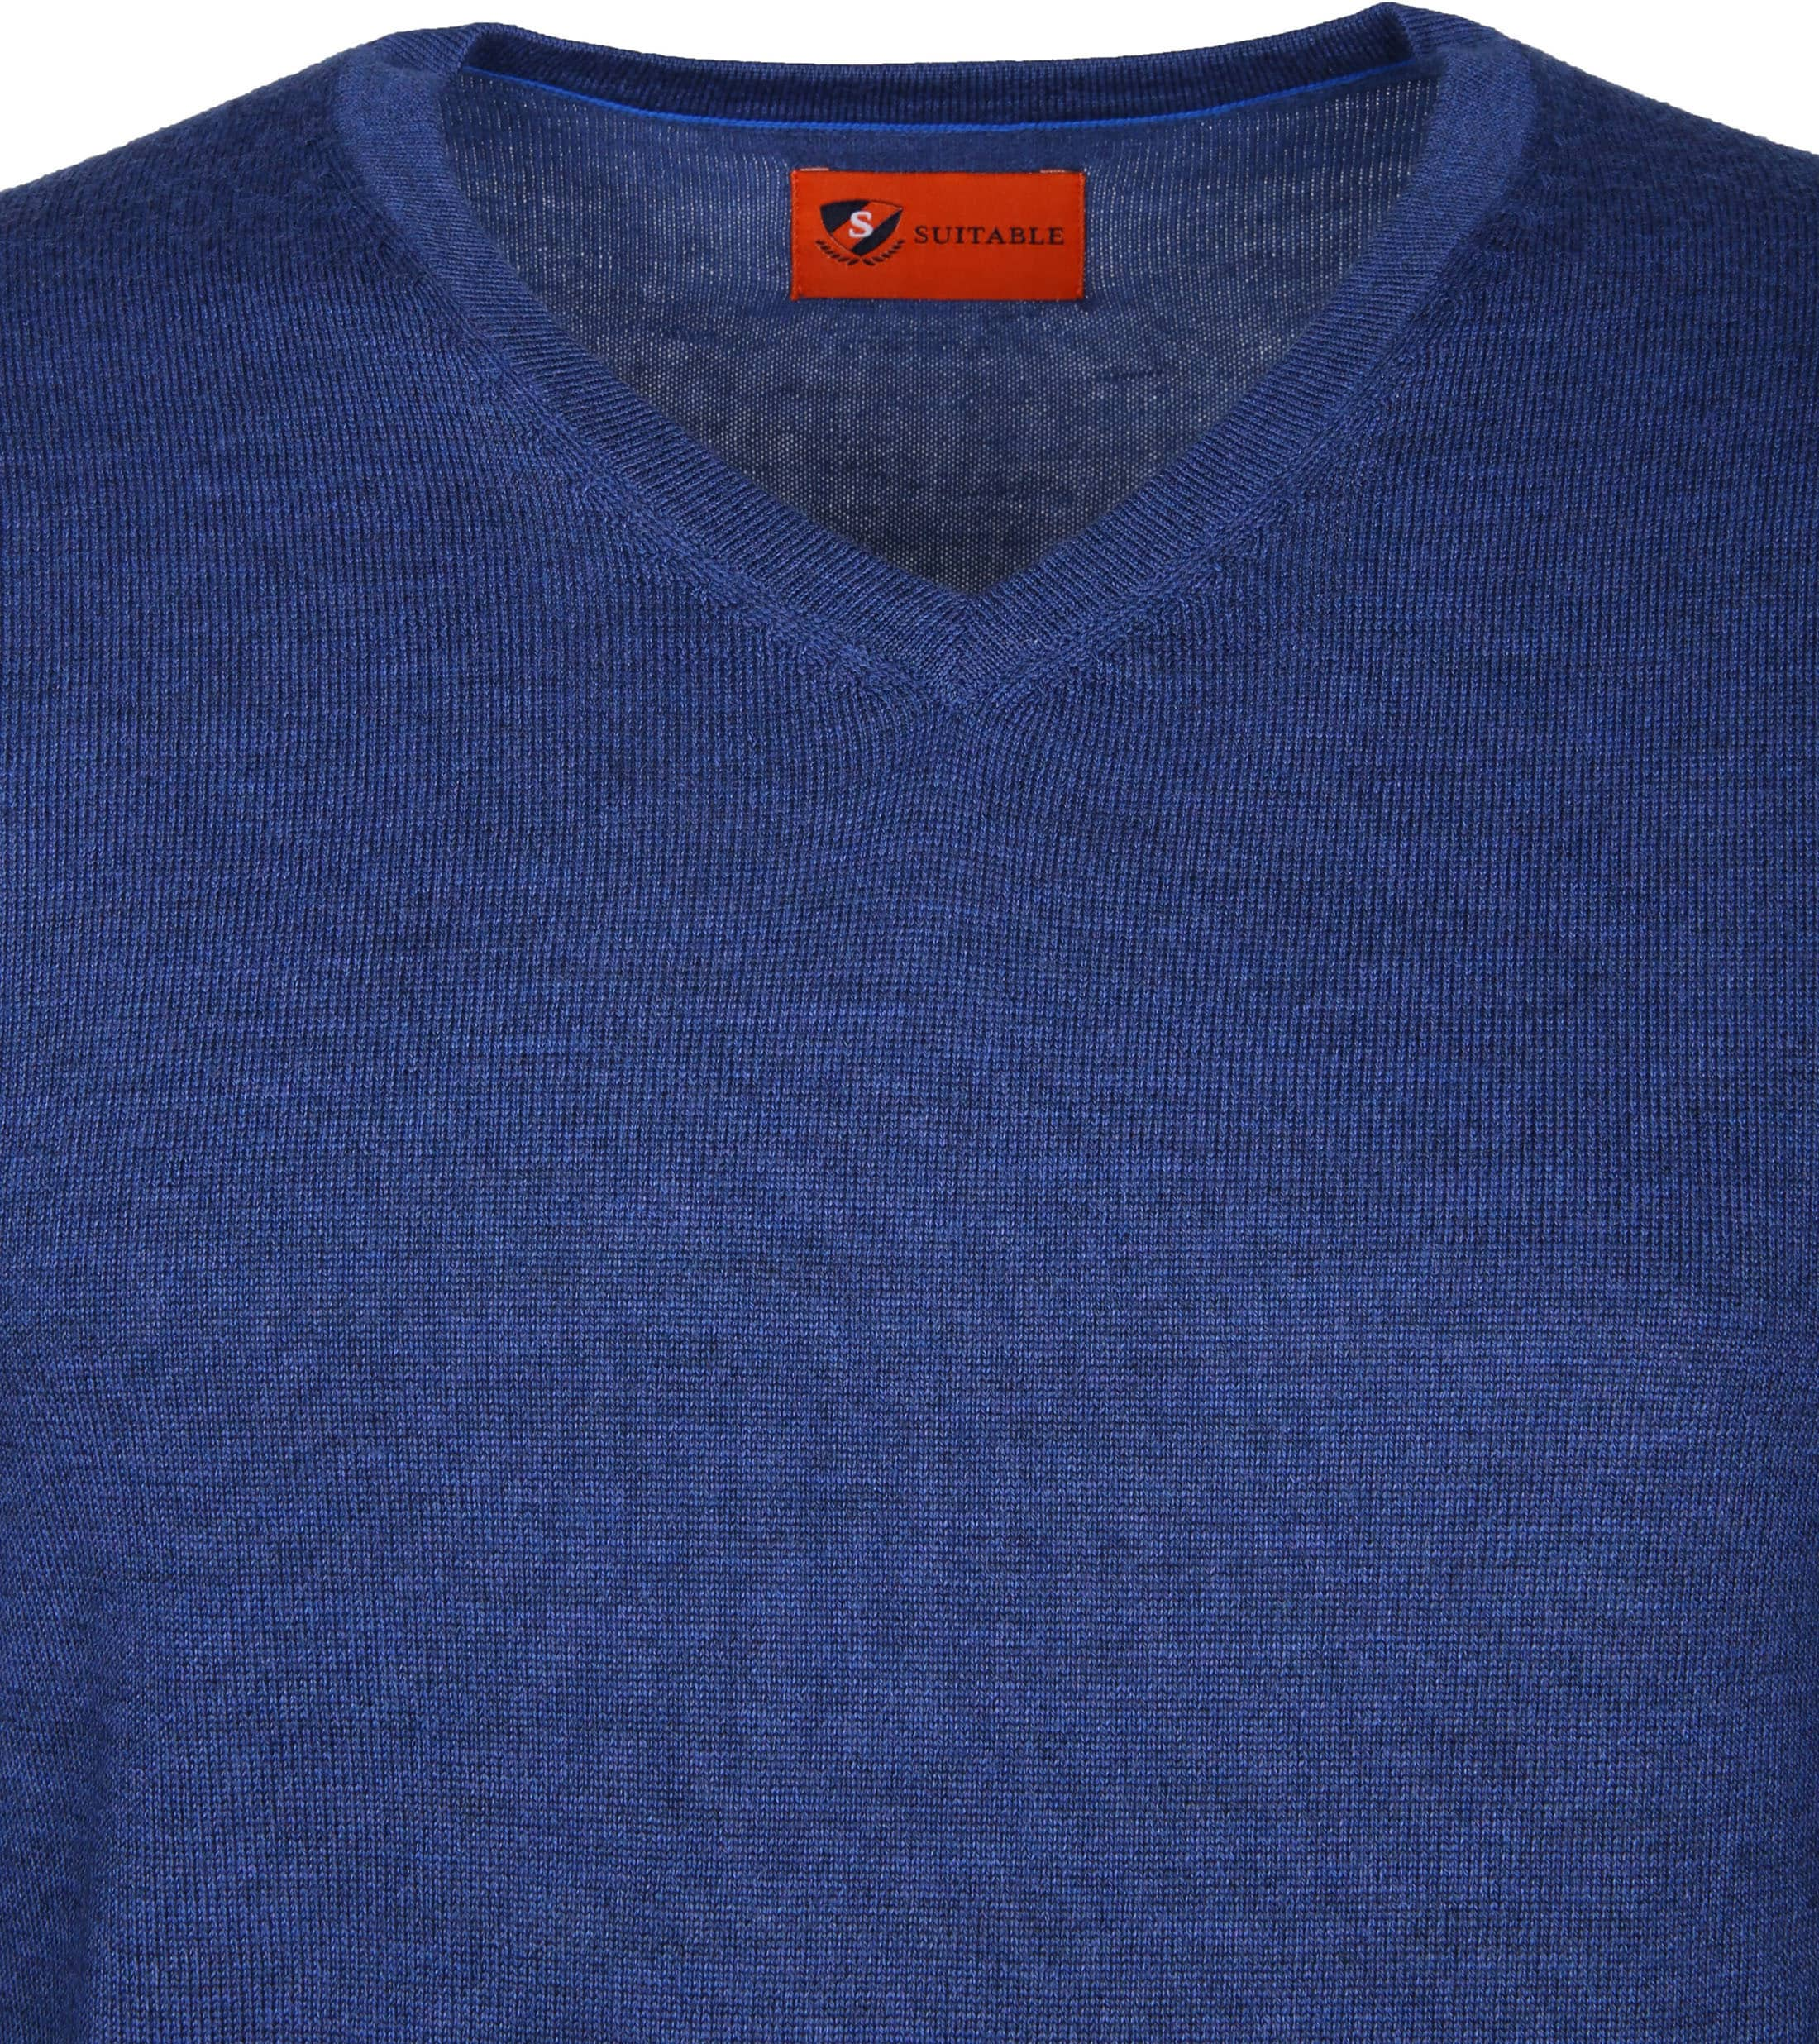 Suitable Pullover Aron Merino Blue foto 1